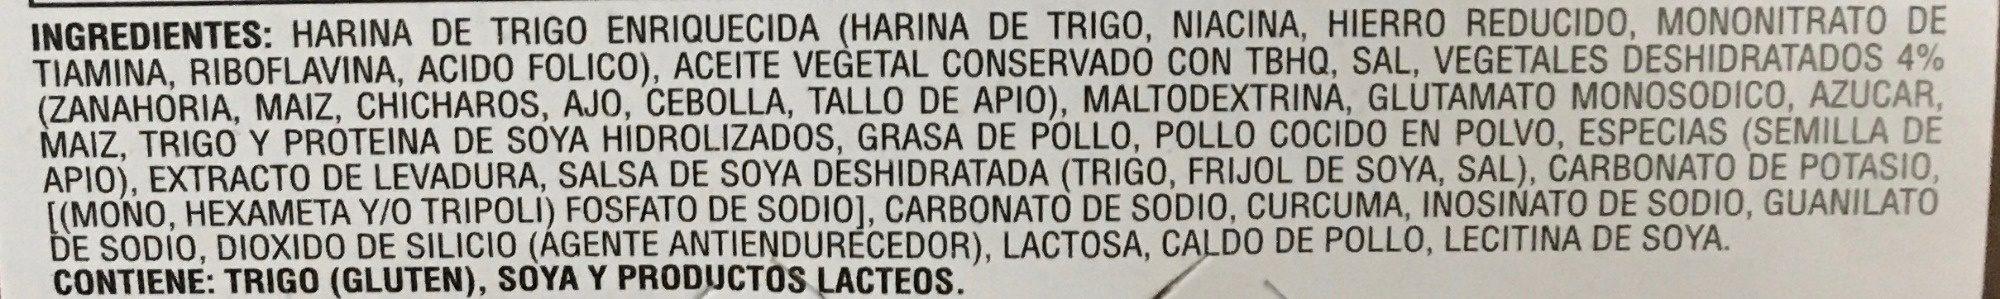 Instant Lunch Sabor a Pollo - Ingredienti - es